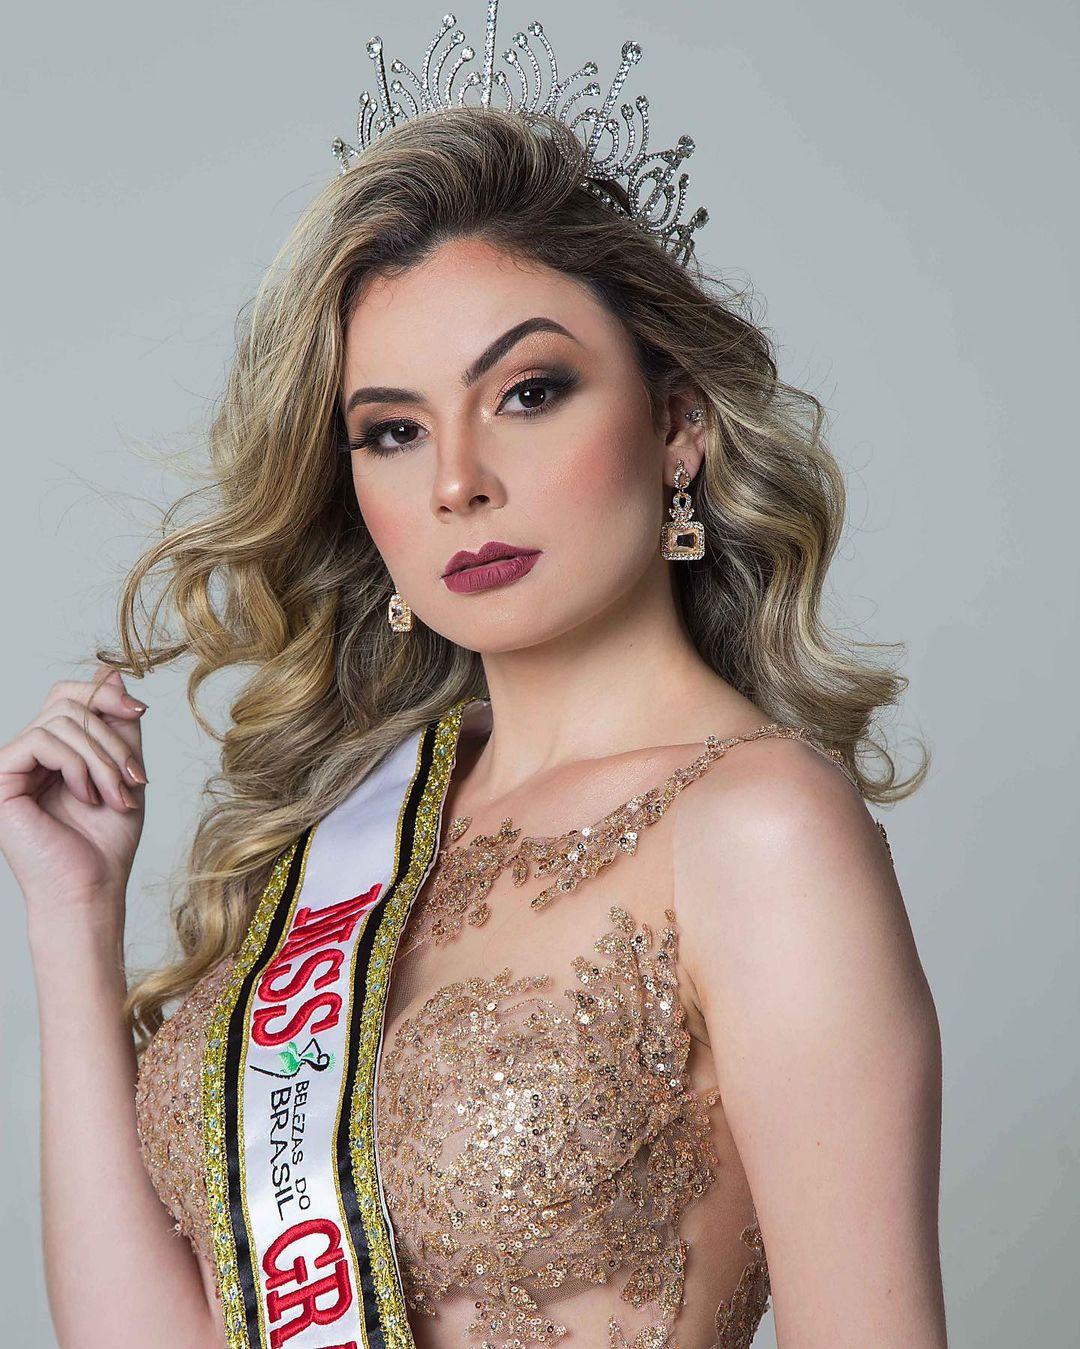 thais bonome, miss beleza da grande sao paulo 2020/miss abcd mundo 2019. 12626216